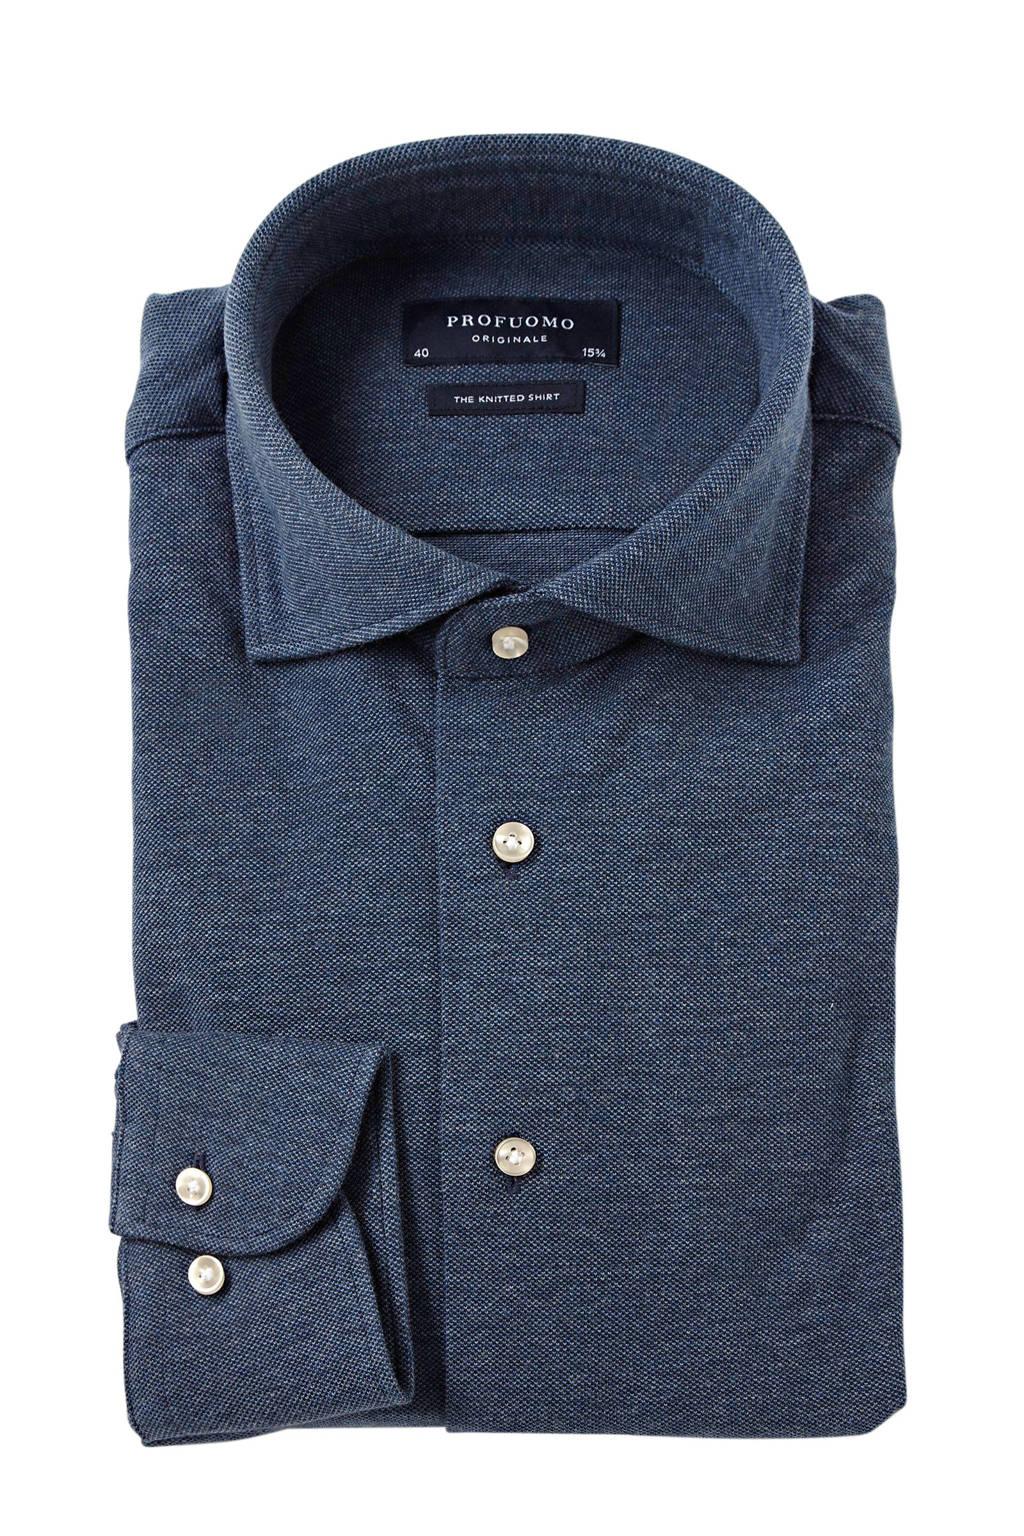 Profuomo slim fit jersey overhemd, Donkerblauw